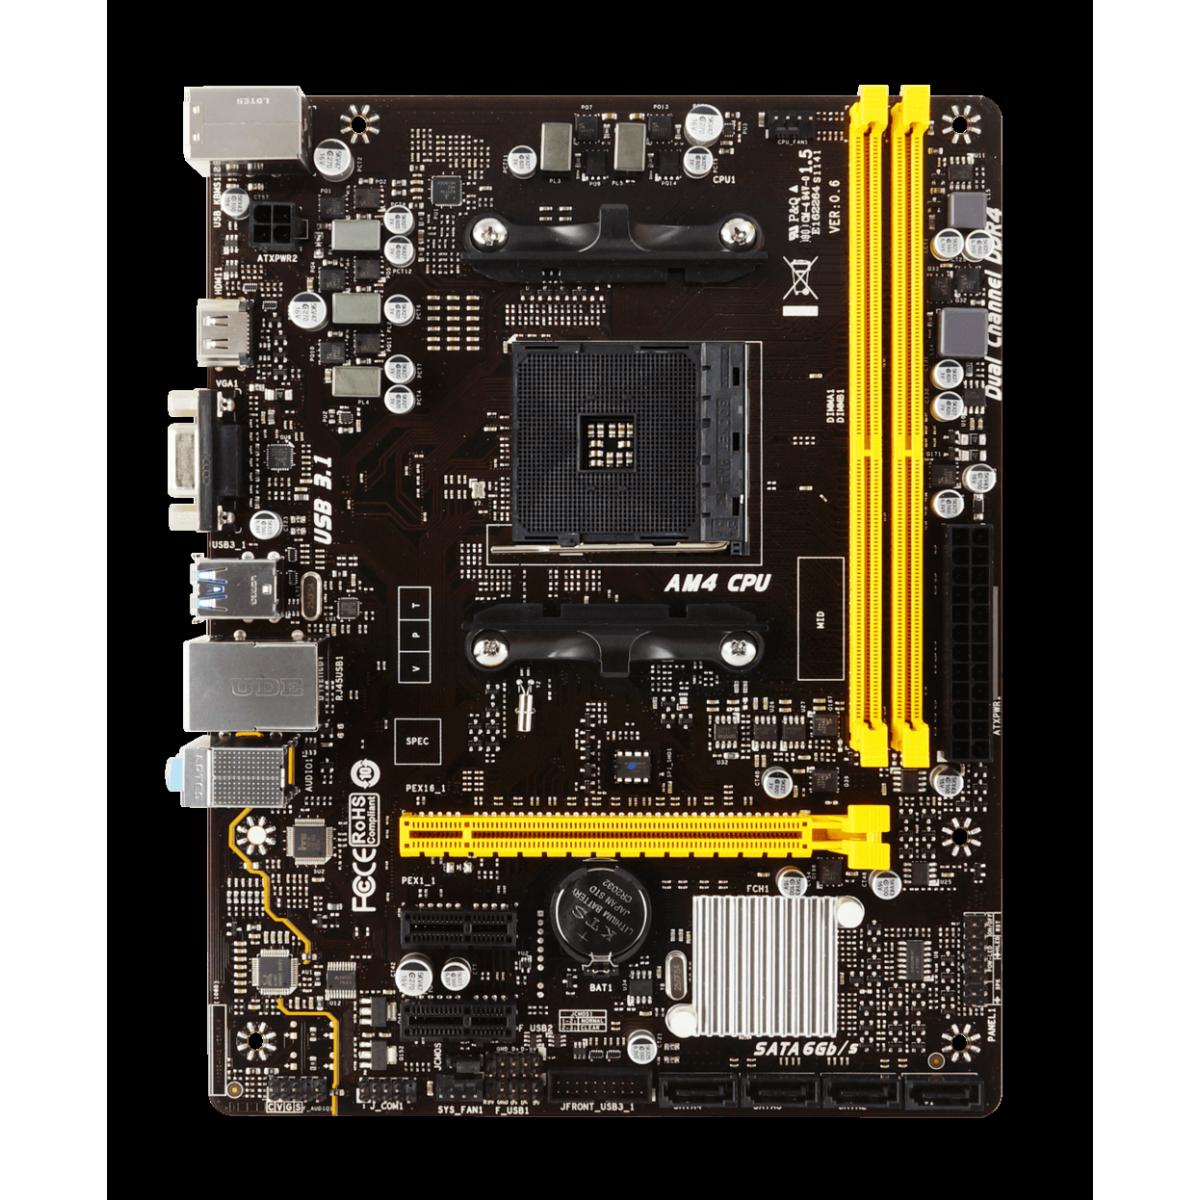 Kit Upgrade Biostar GeForce GT 710 + Intel Core i5 10400F + Biostar A320MH + Geil Evo Potenza, 8GB 3000MHz